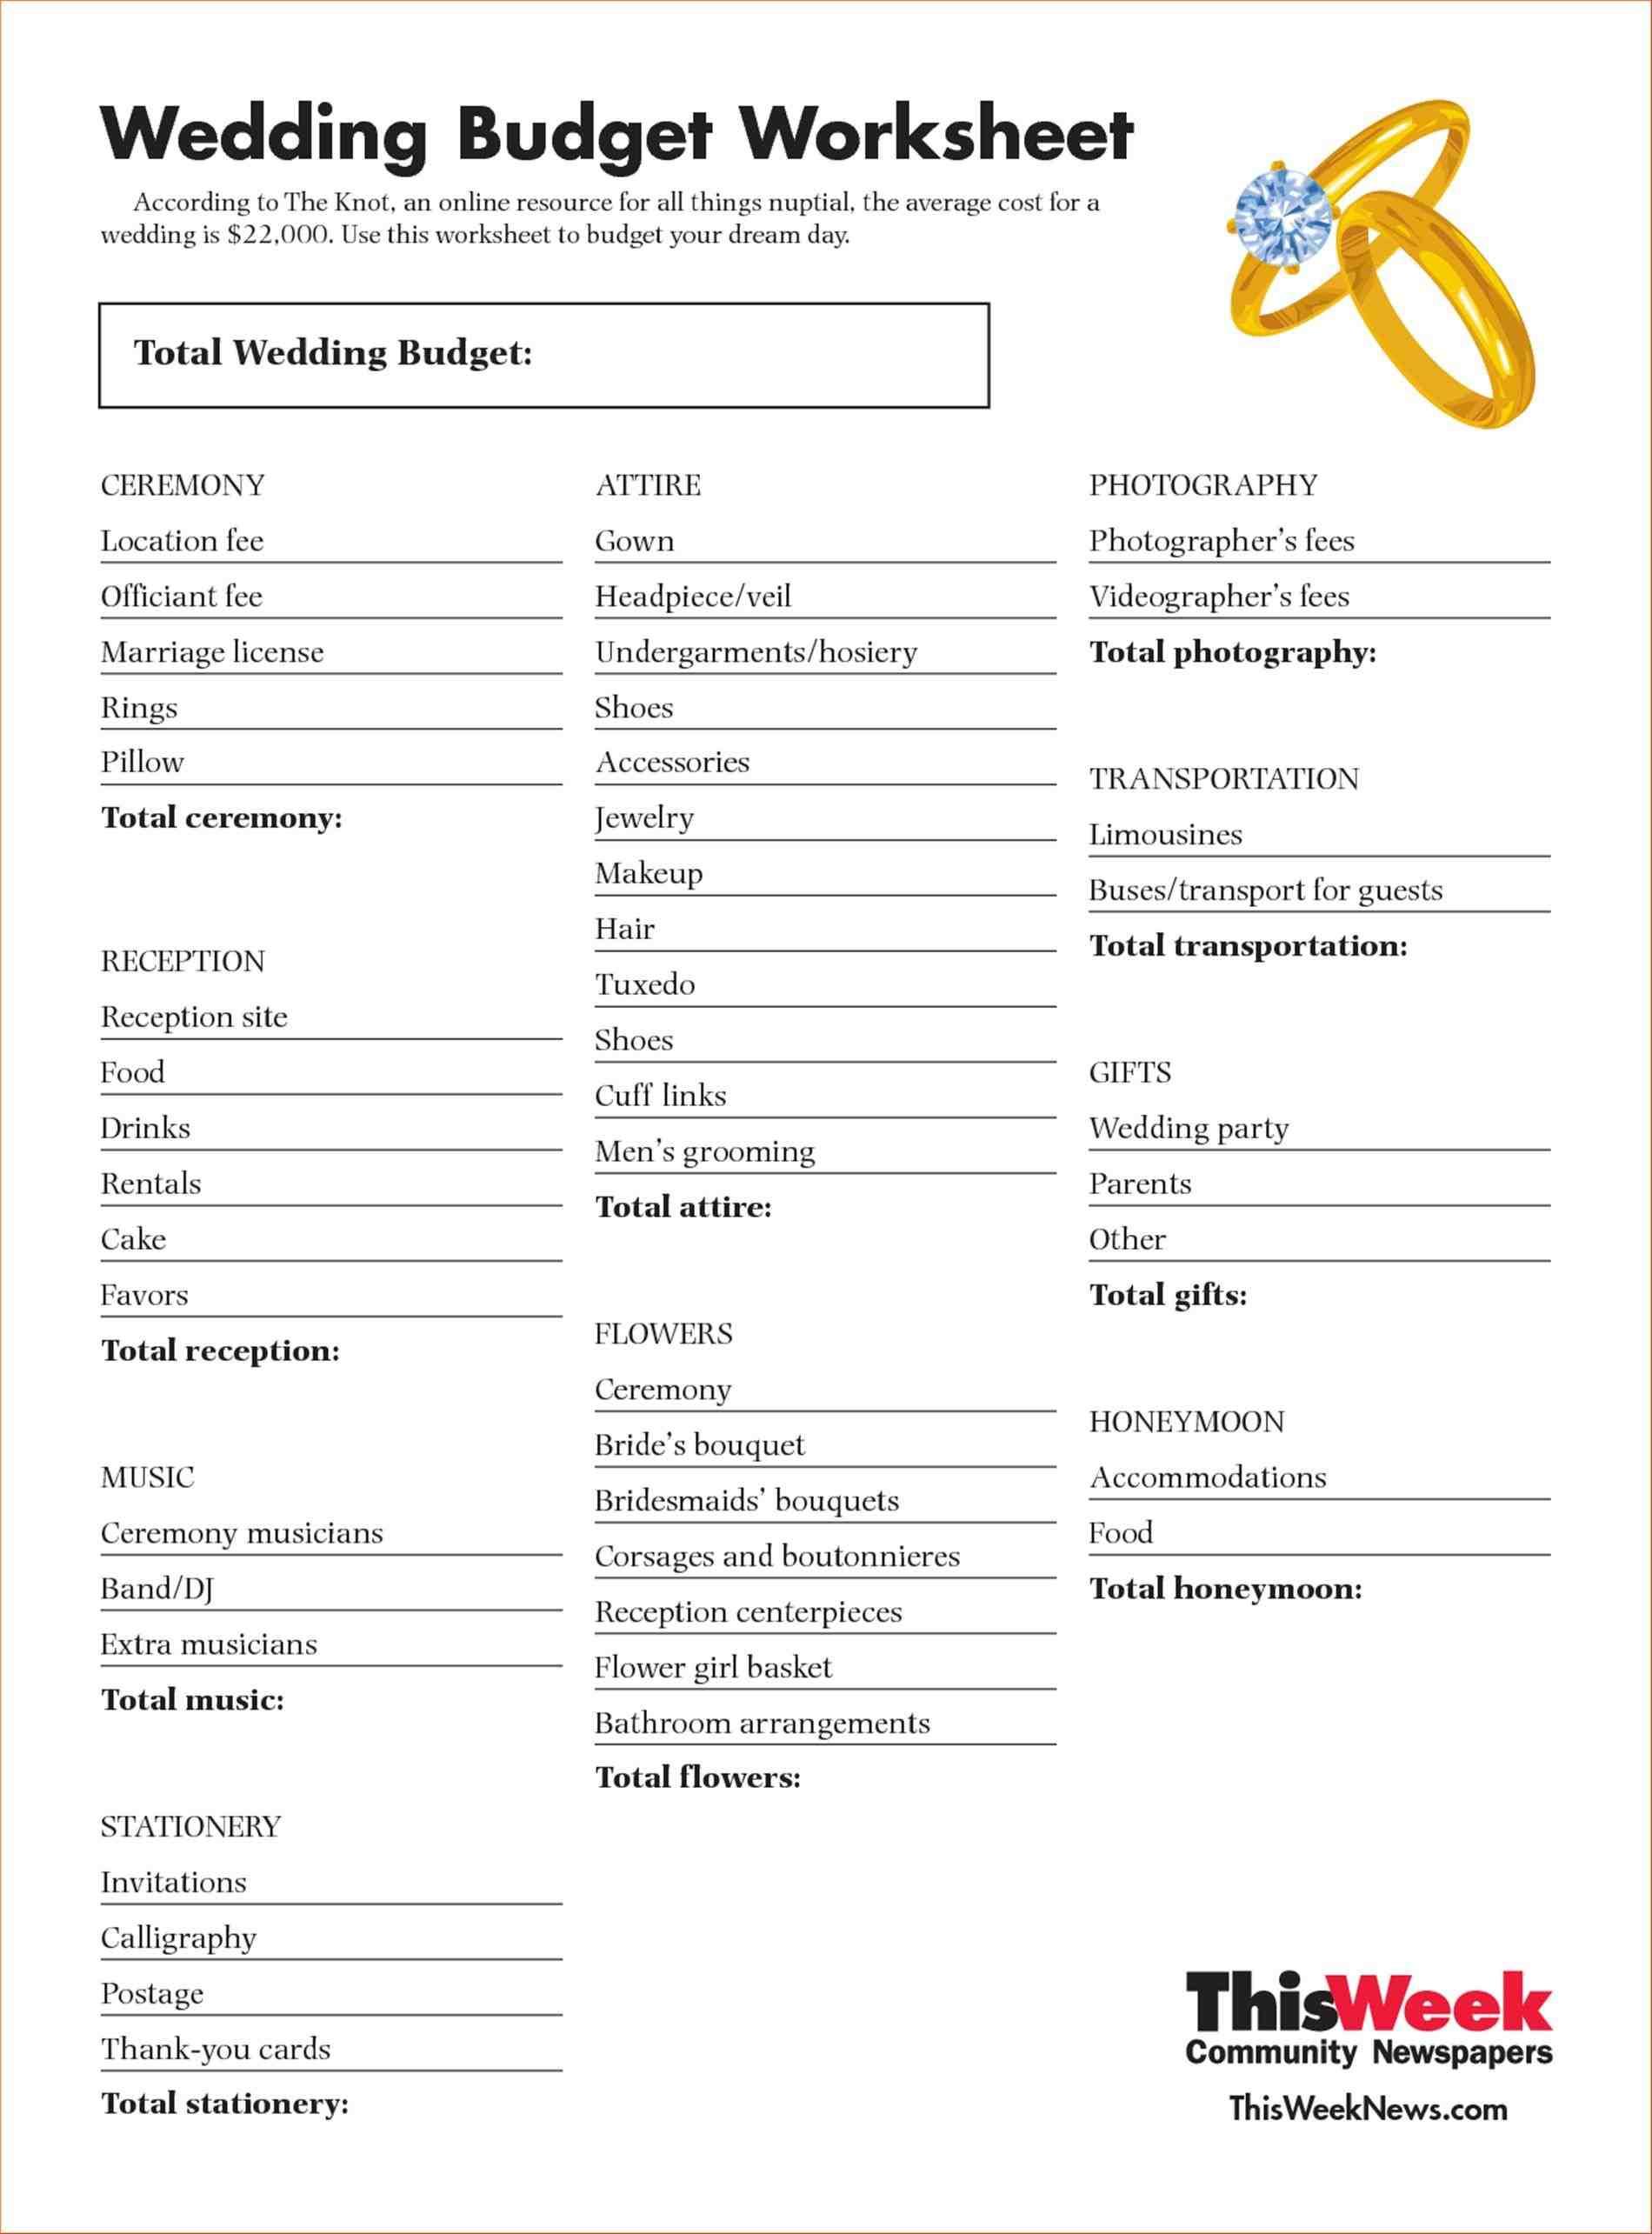 Wedding Event Expense Calculator Worksheet